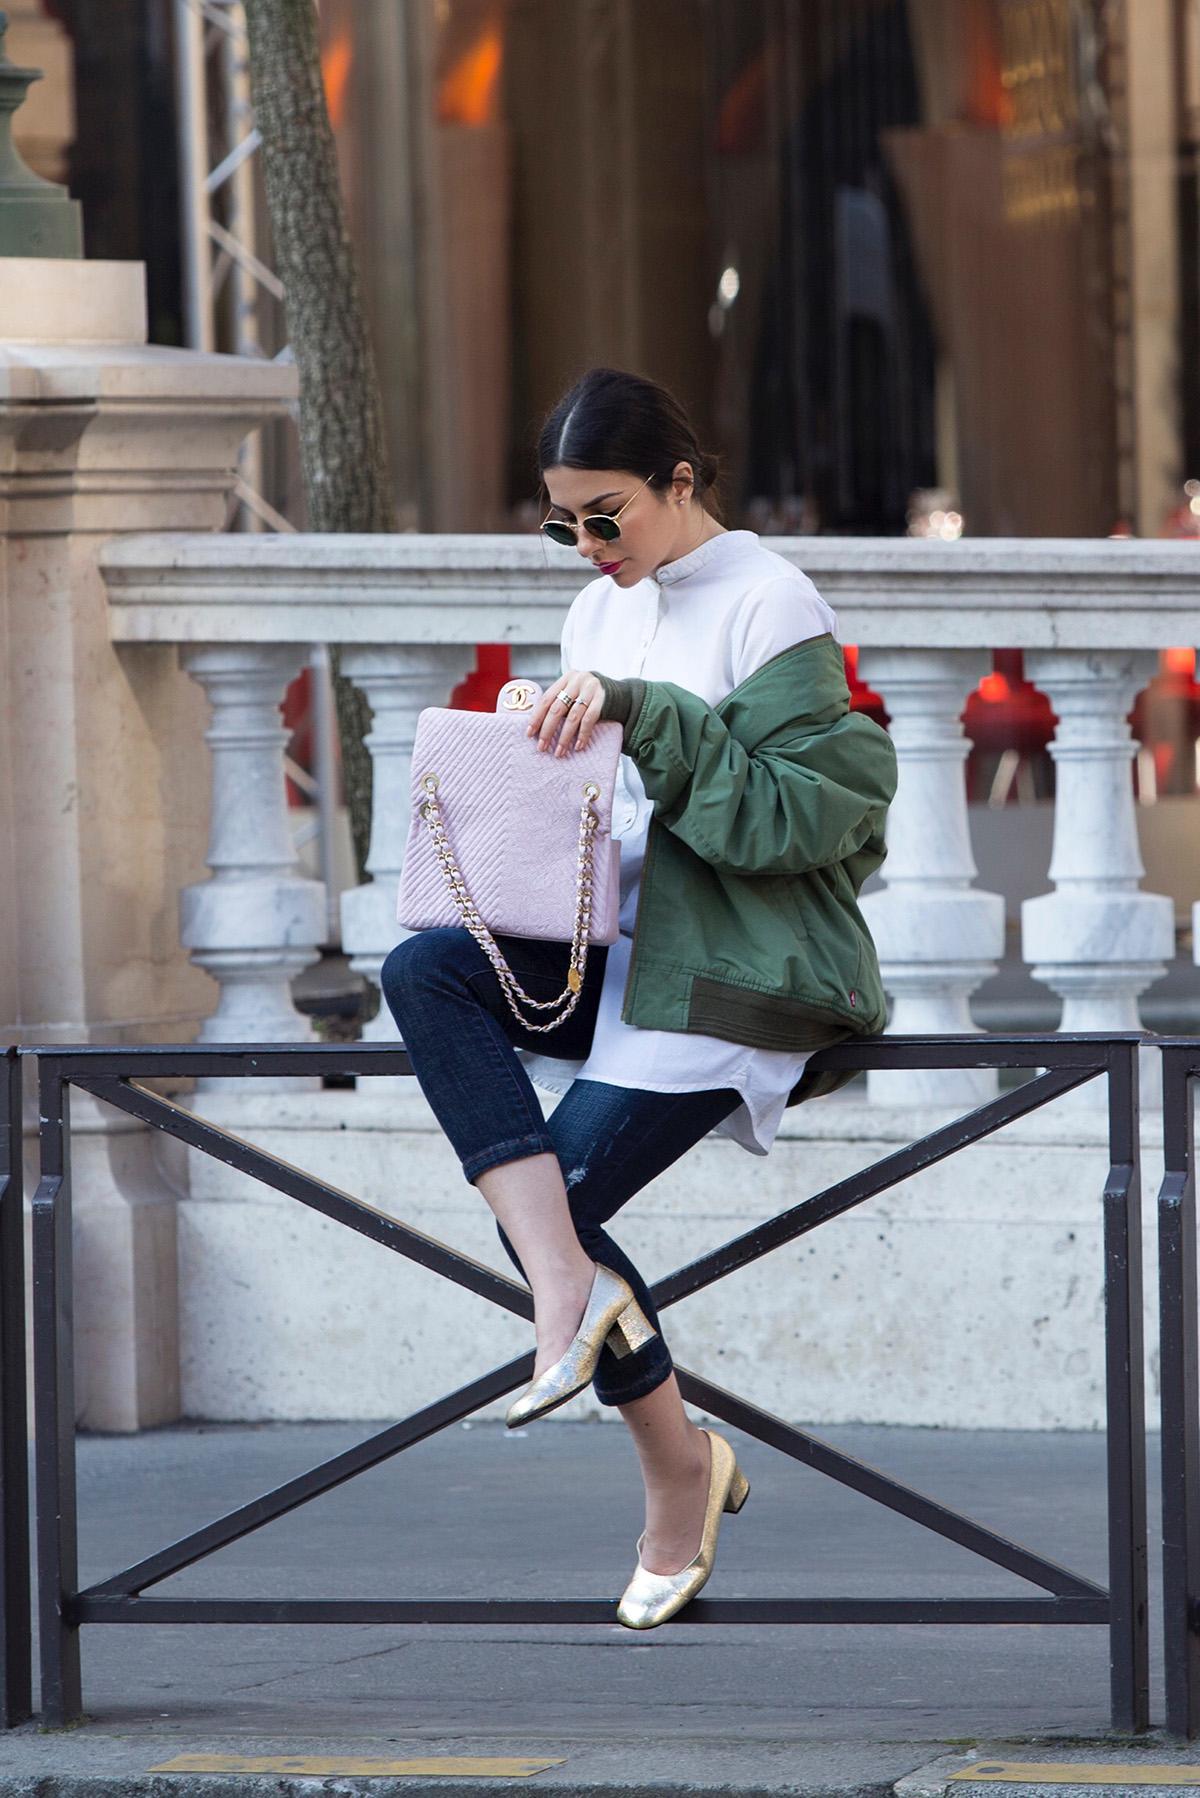 Stella Asteria - Fashion & Lifestyle Blogger wearing khaki bomber jacket and pink Chanel bag